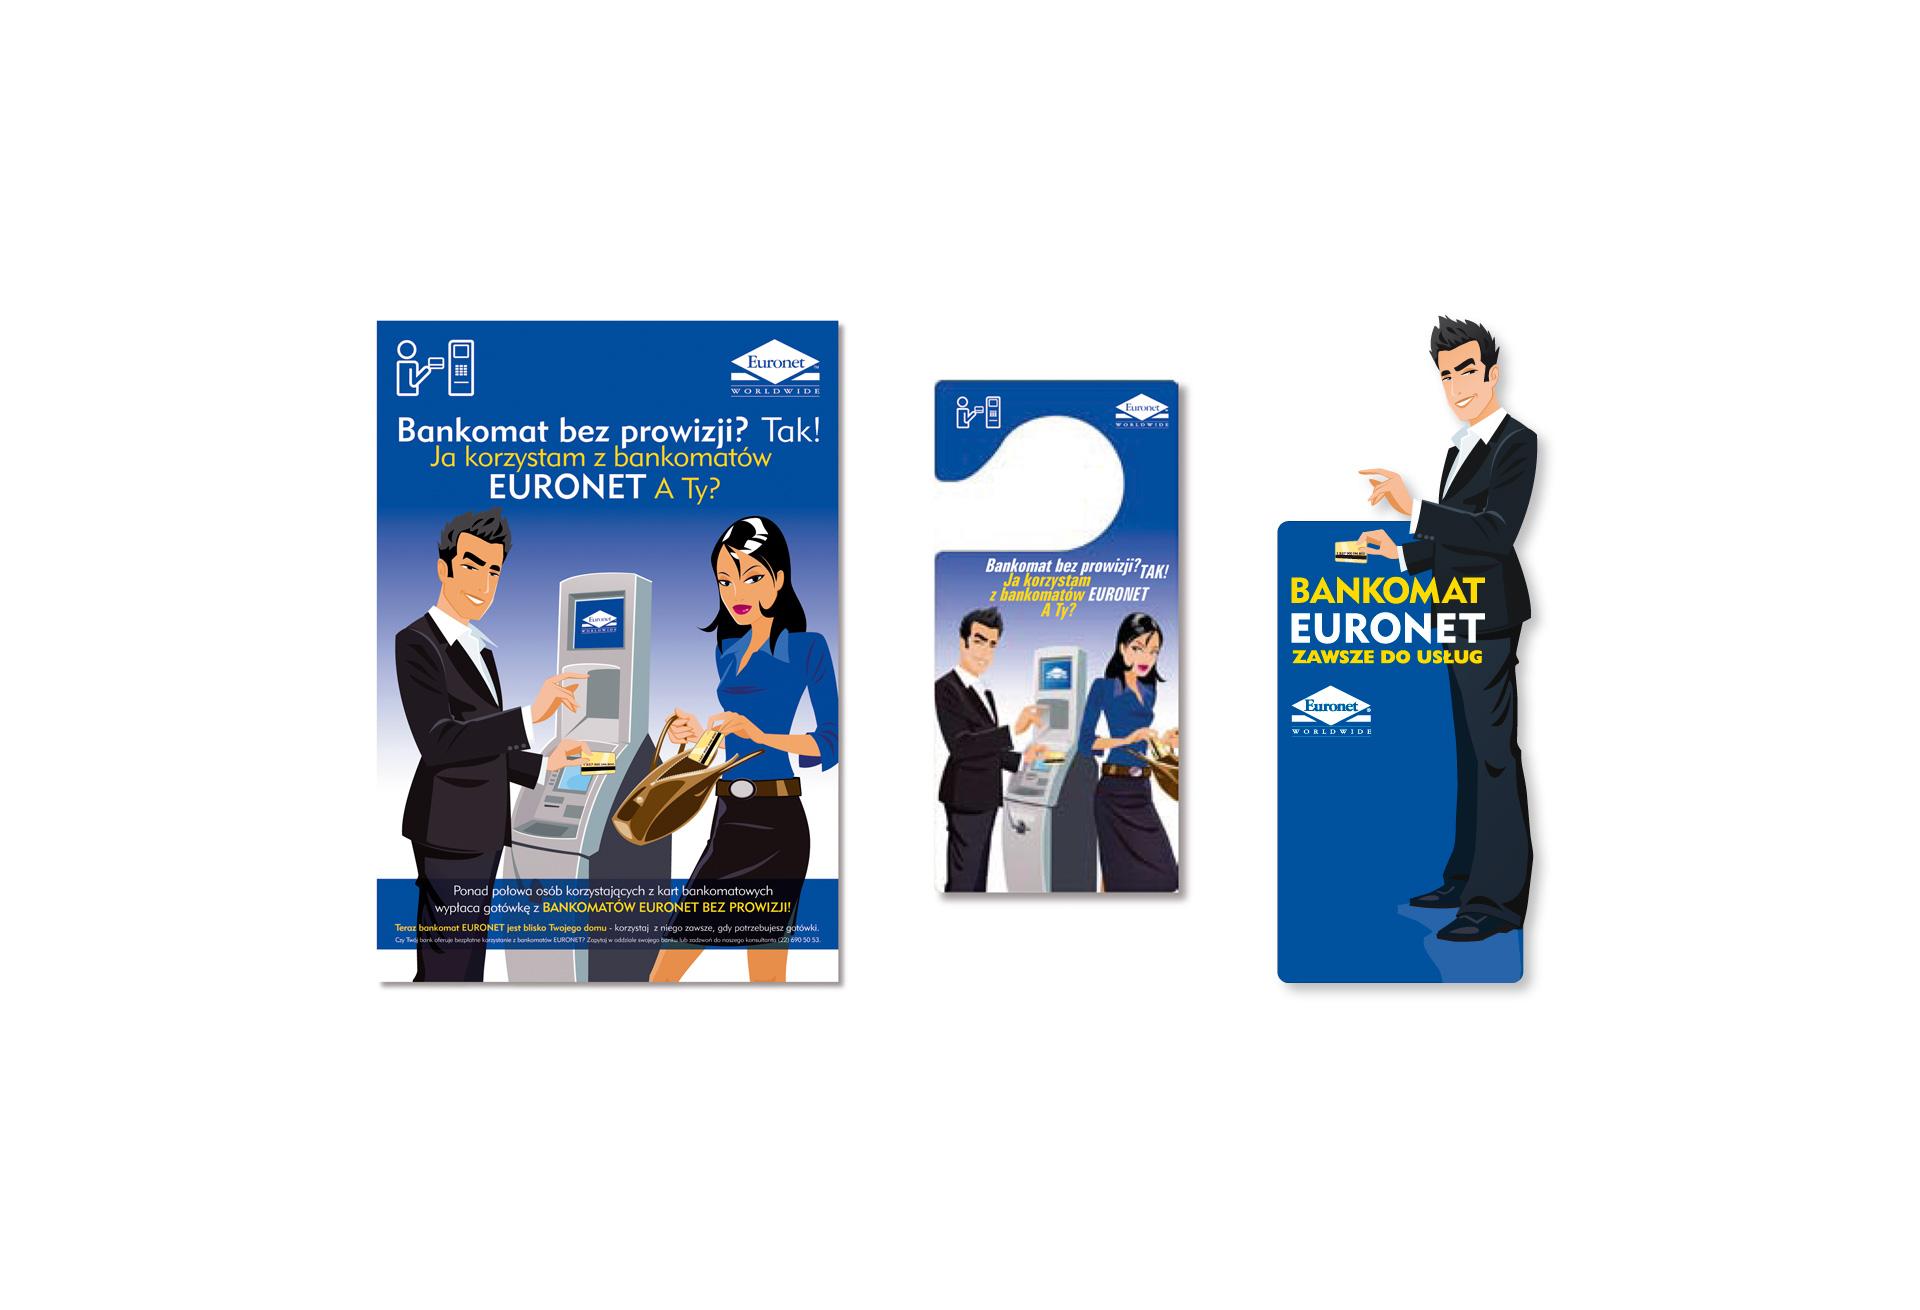 euronet bankomat kampania